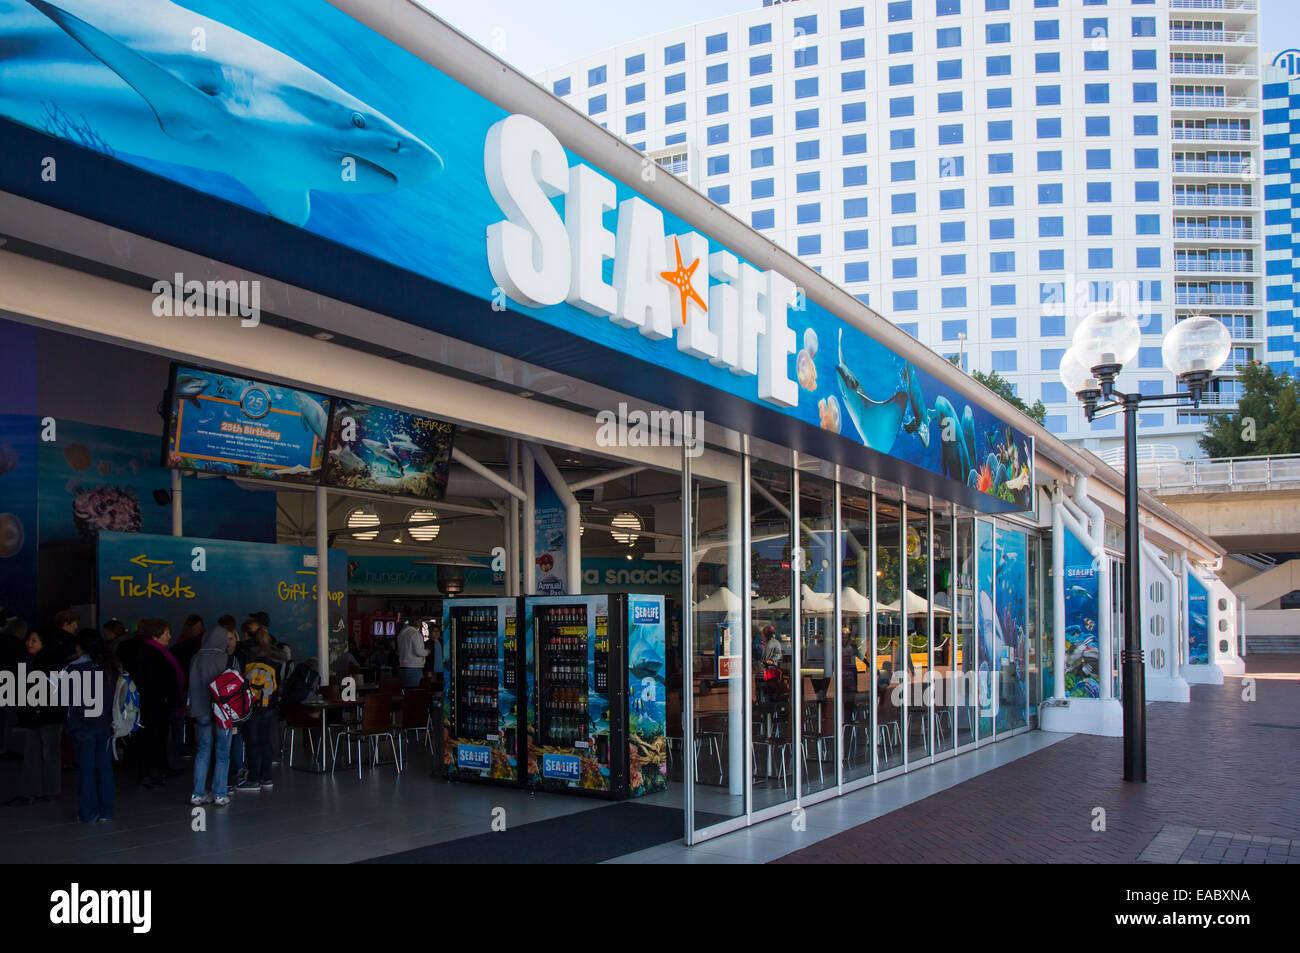 Entrance to Sydney Sea Life Aquarium, Darling Harbour, Sydney, Australia - Stock Image